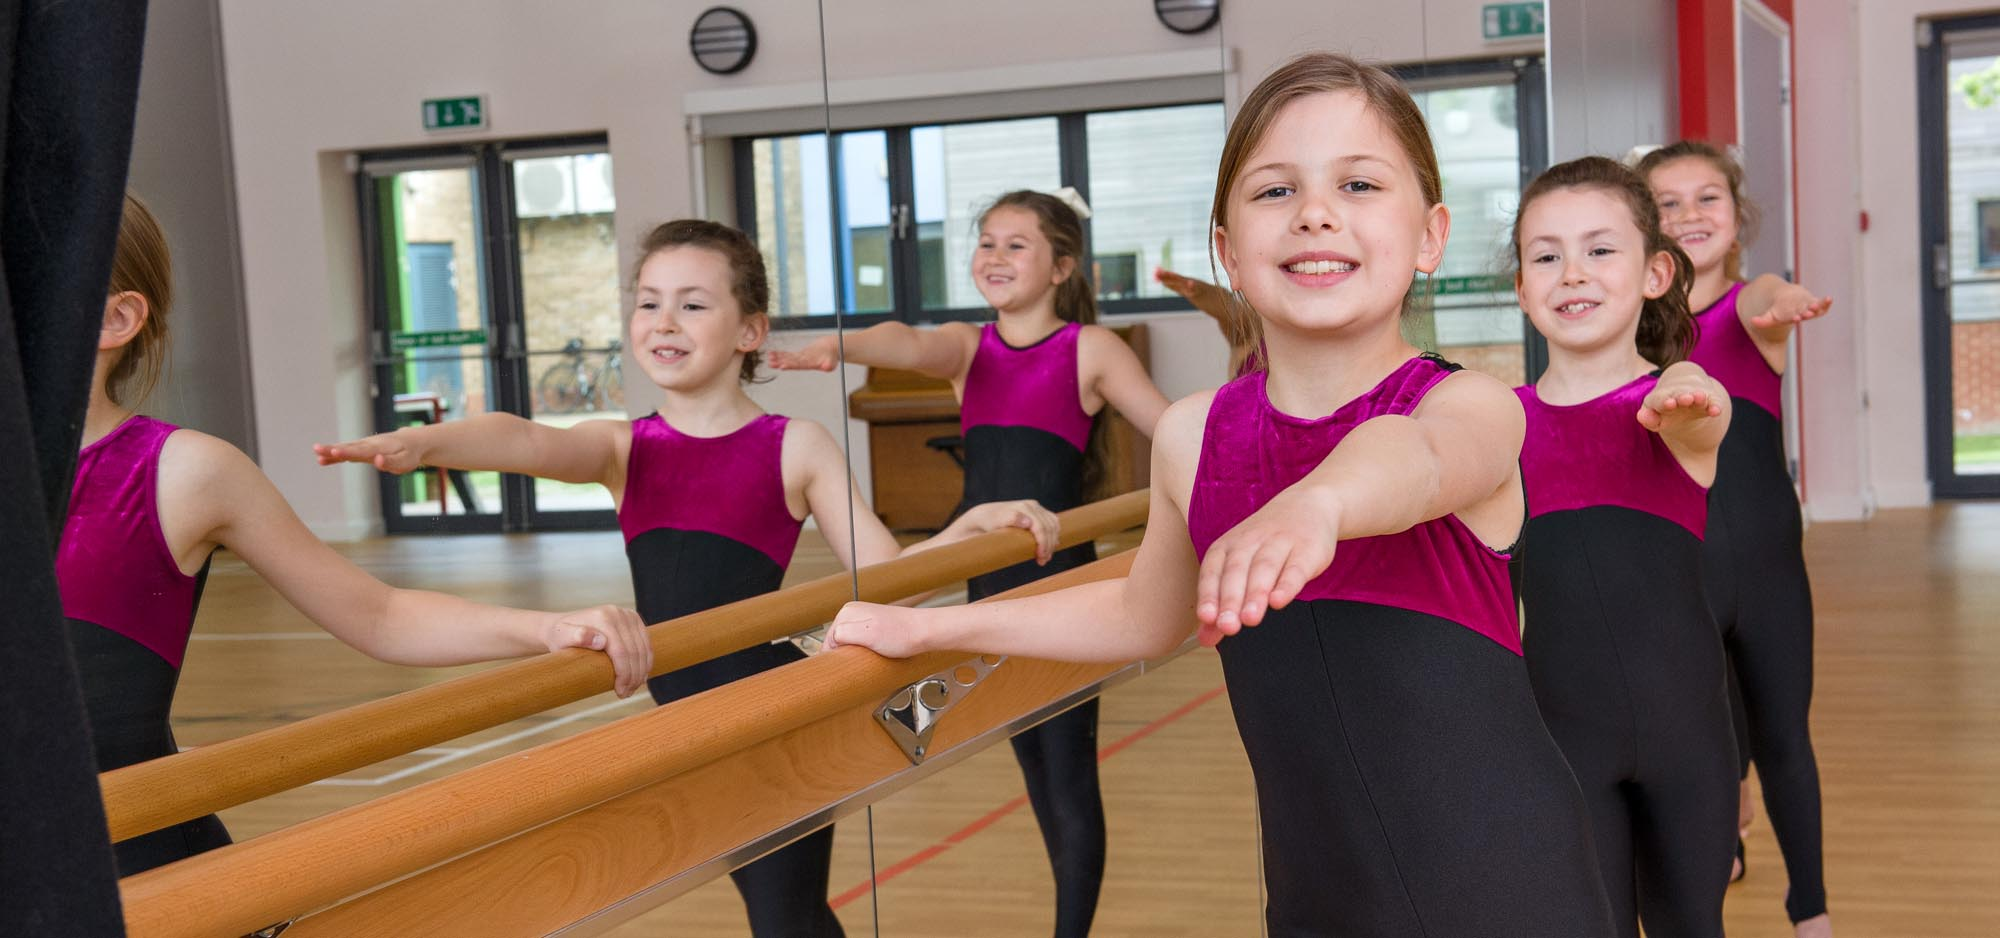 girls-ballet-barre-exercise